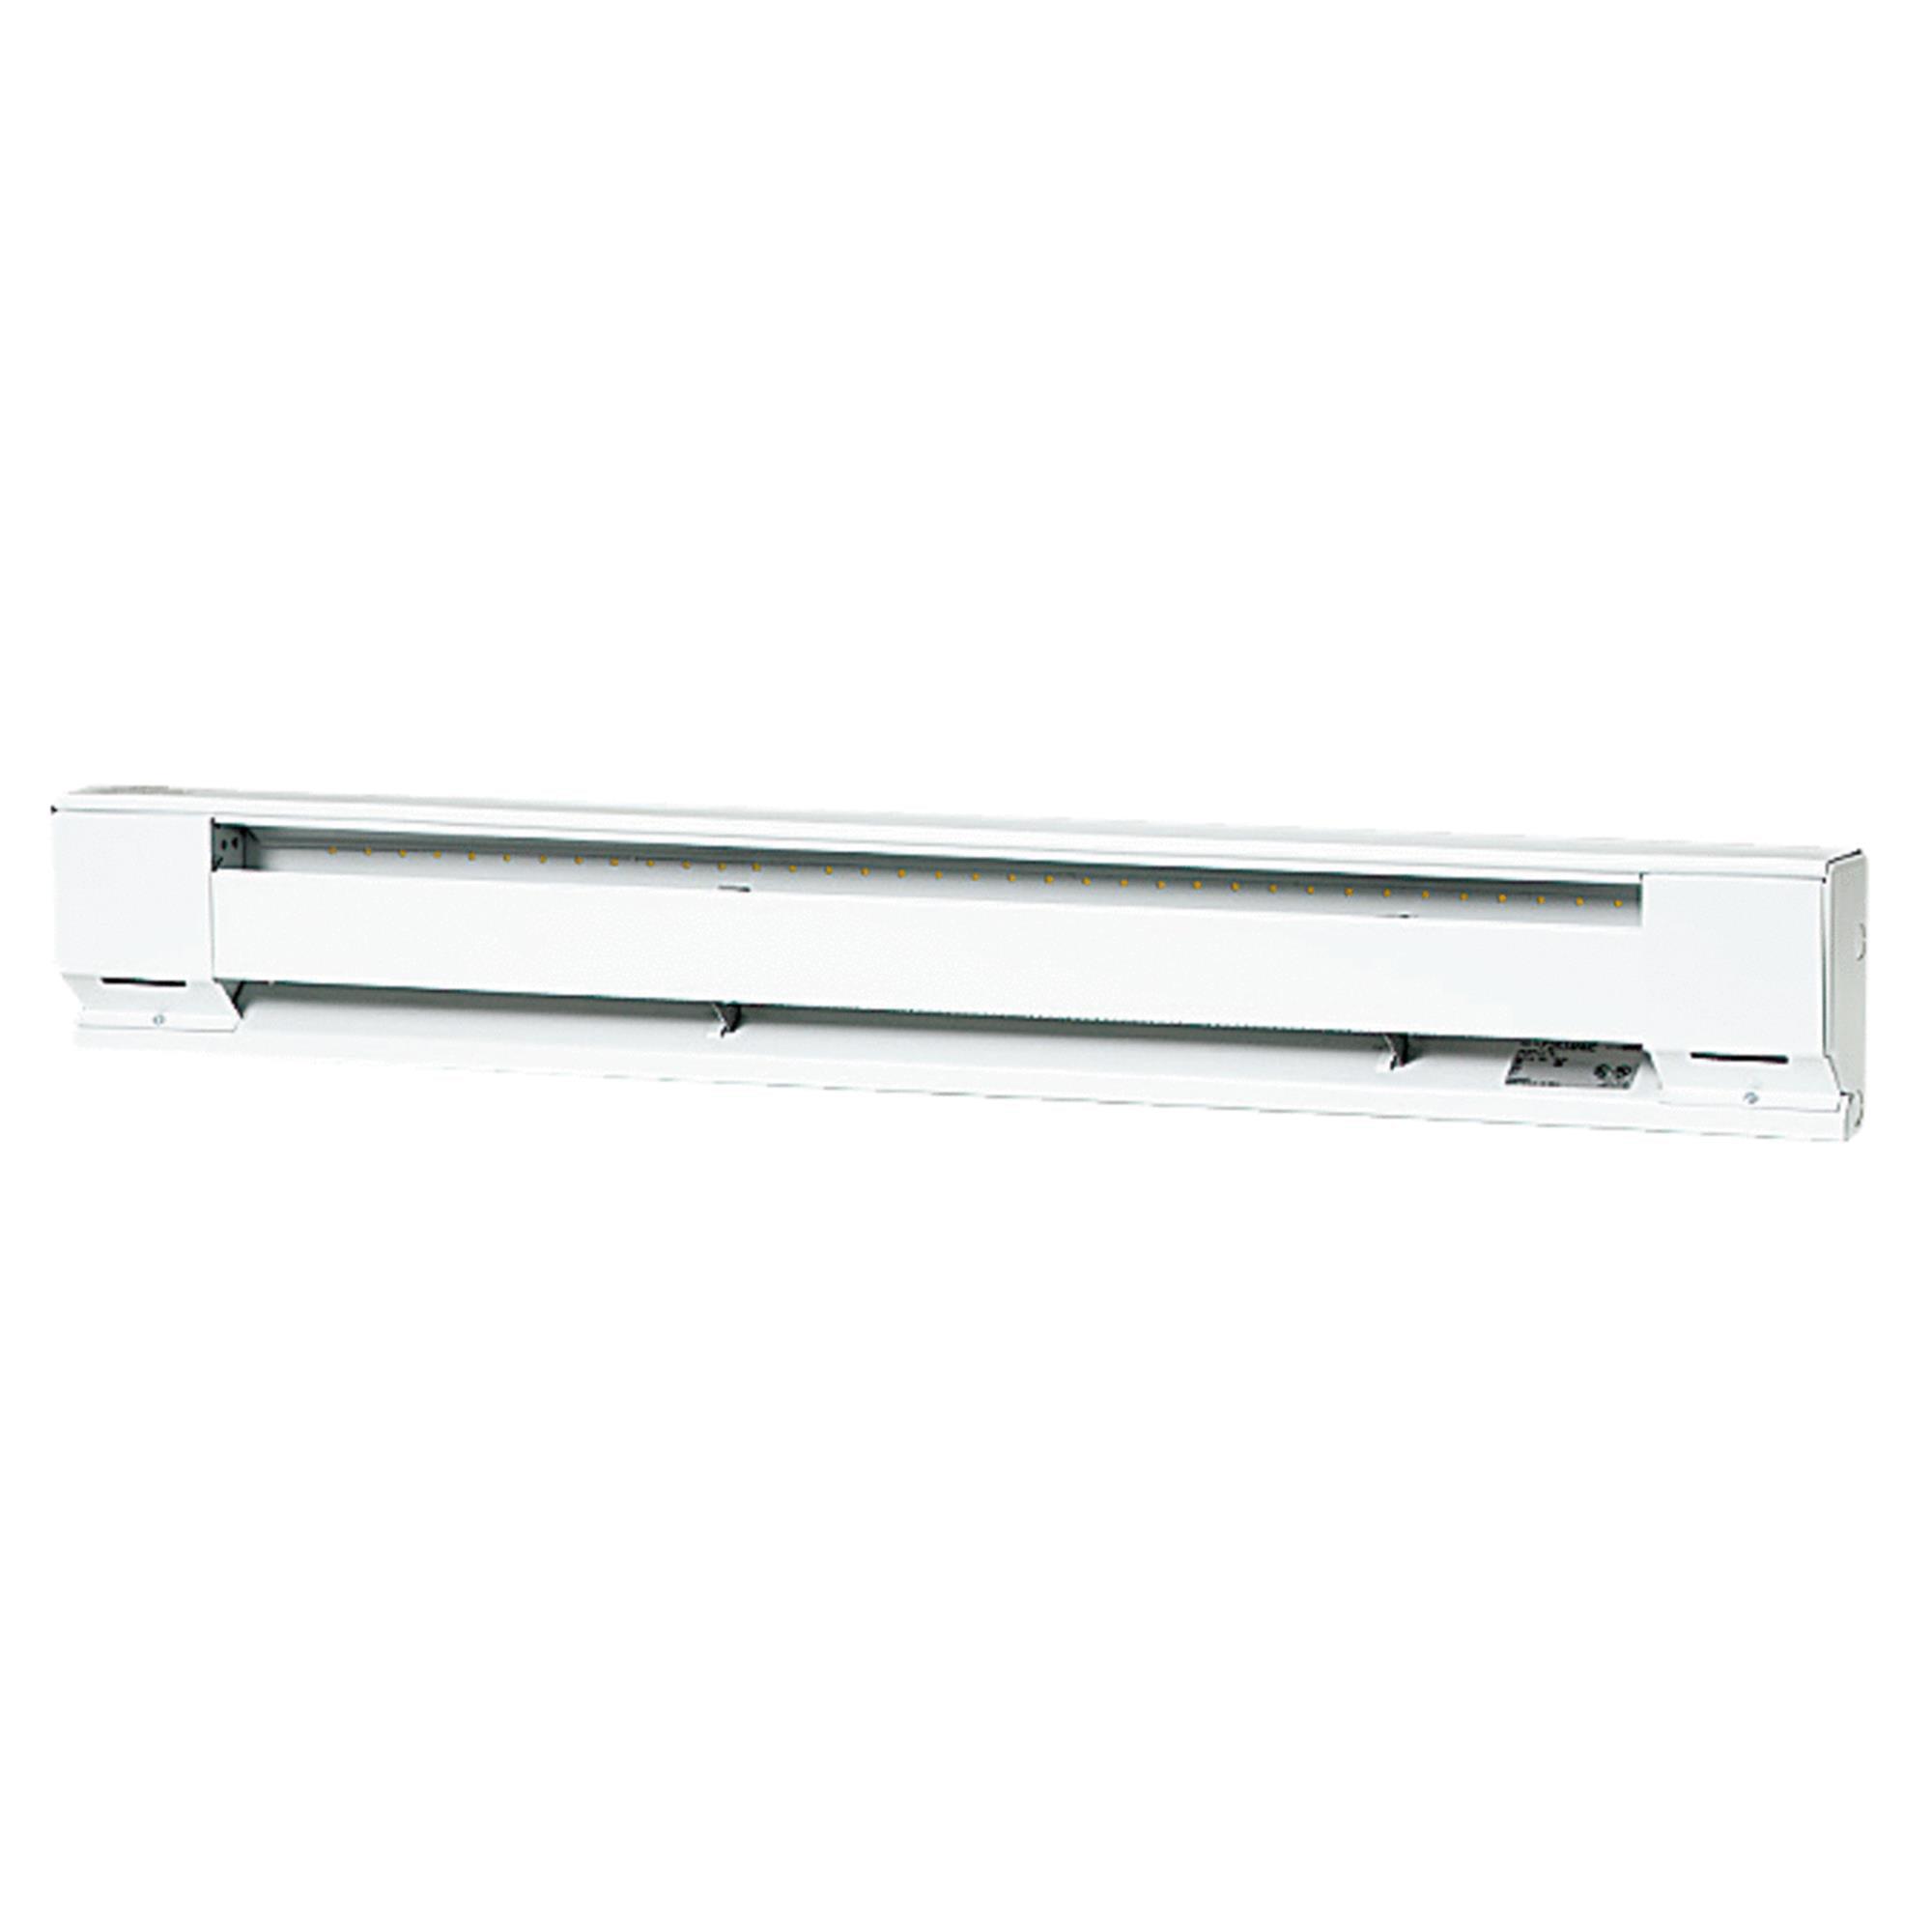 Fahrenheat Utility Well House Electric Baseboard Heater